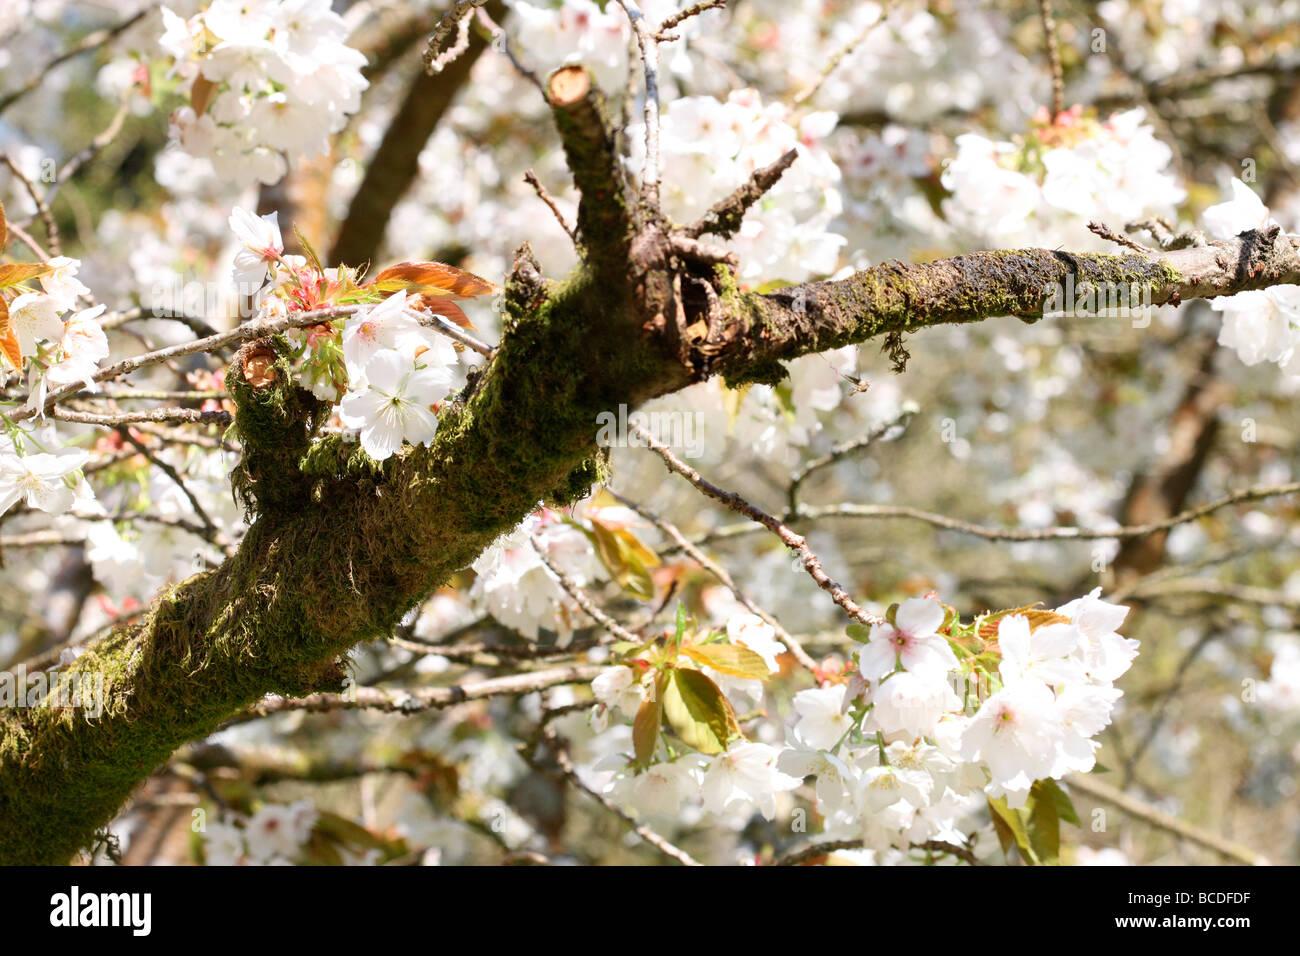 beautiful oriental cherry fine art photography Jane Ann Butler Photography JABP447 - Stock Image